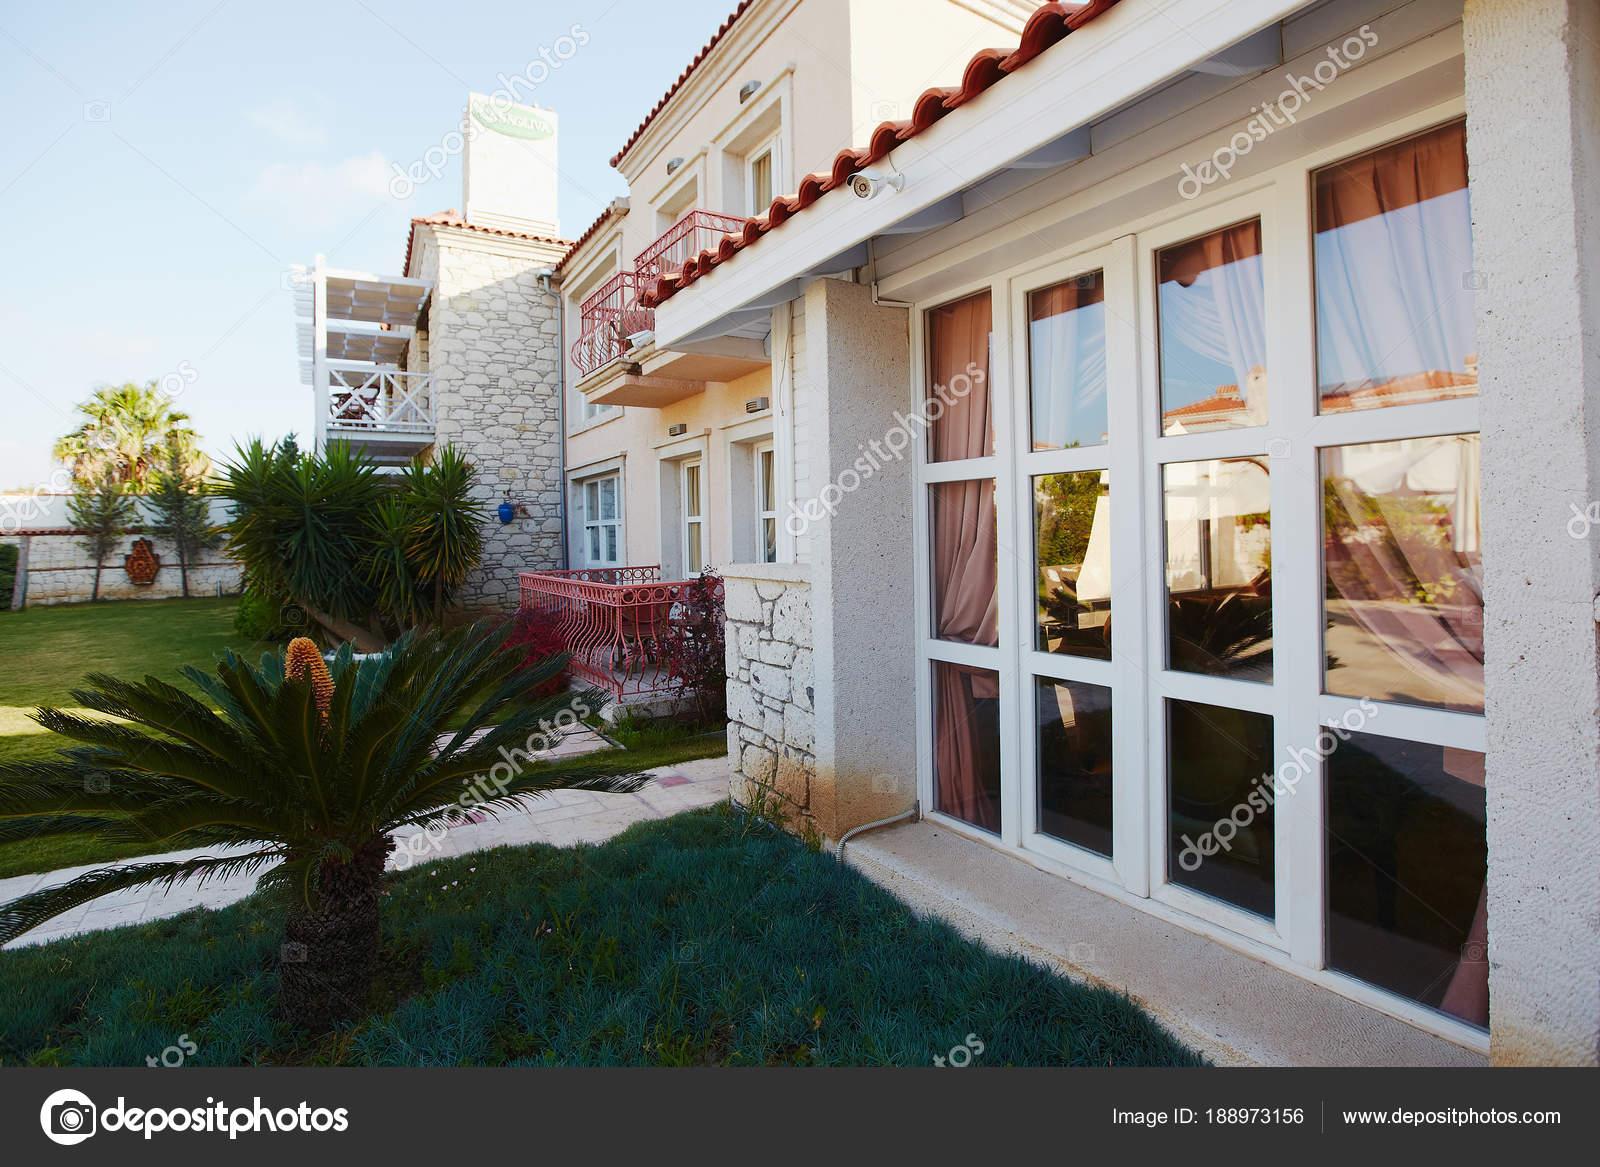 Grote Foto Aan De Muur.Mooie Grote Muur Formaat Venster En Tuin In Klein Hotel Stockfoto